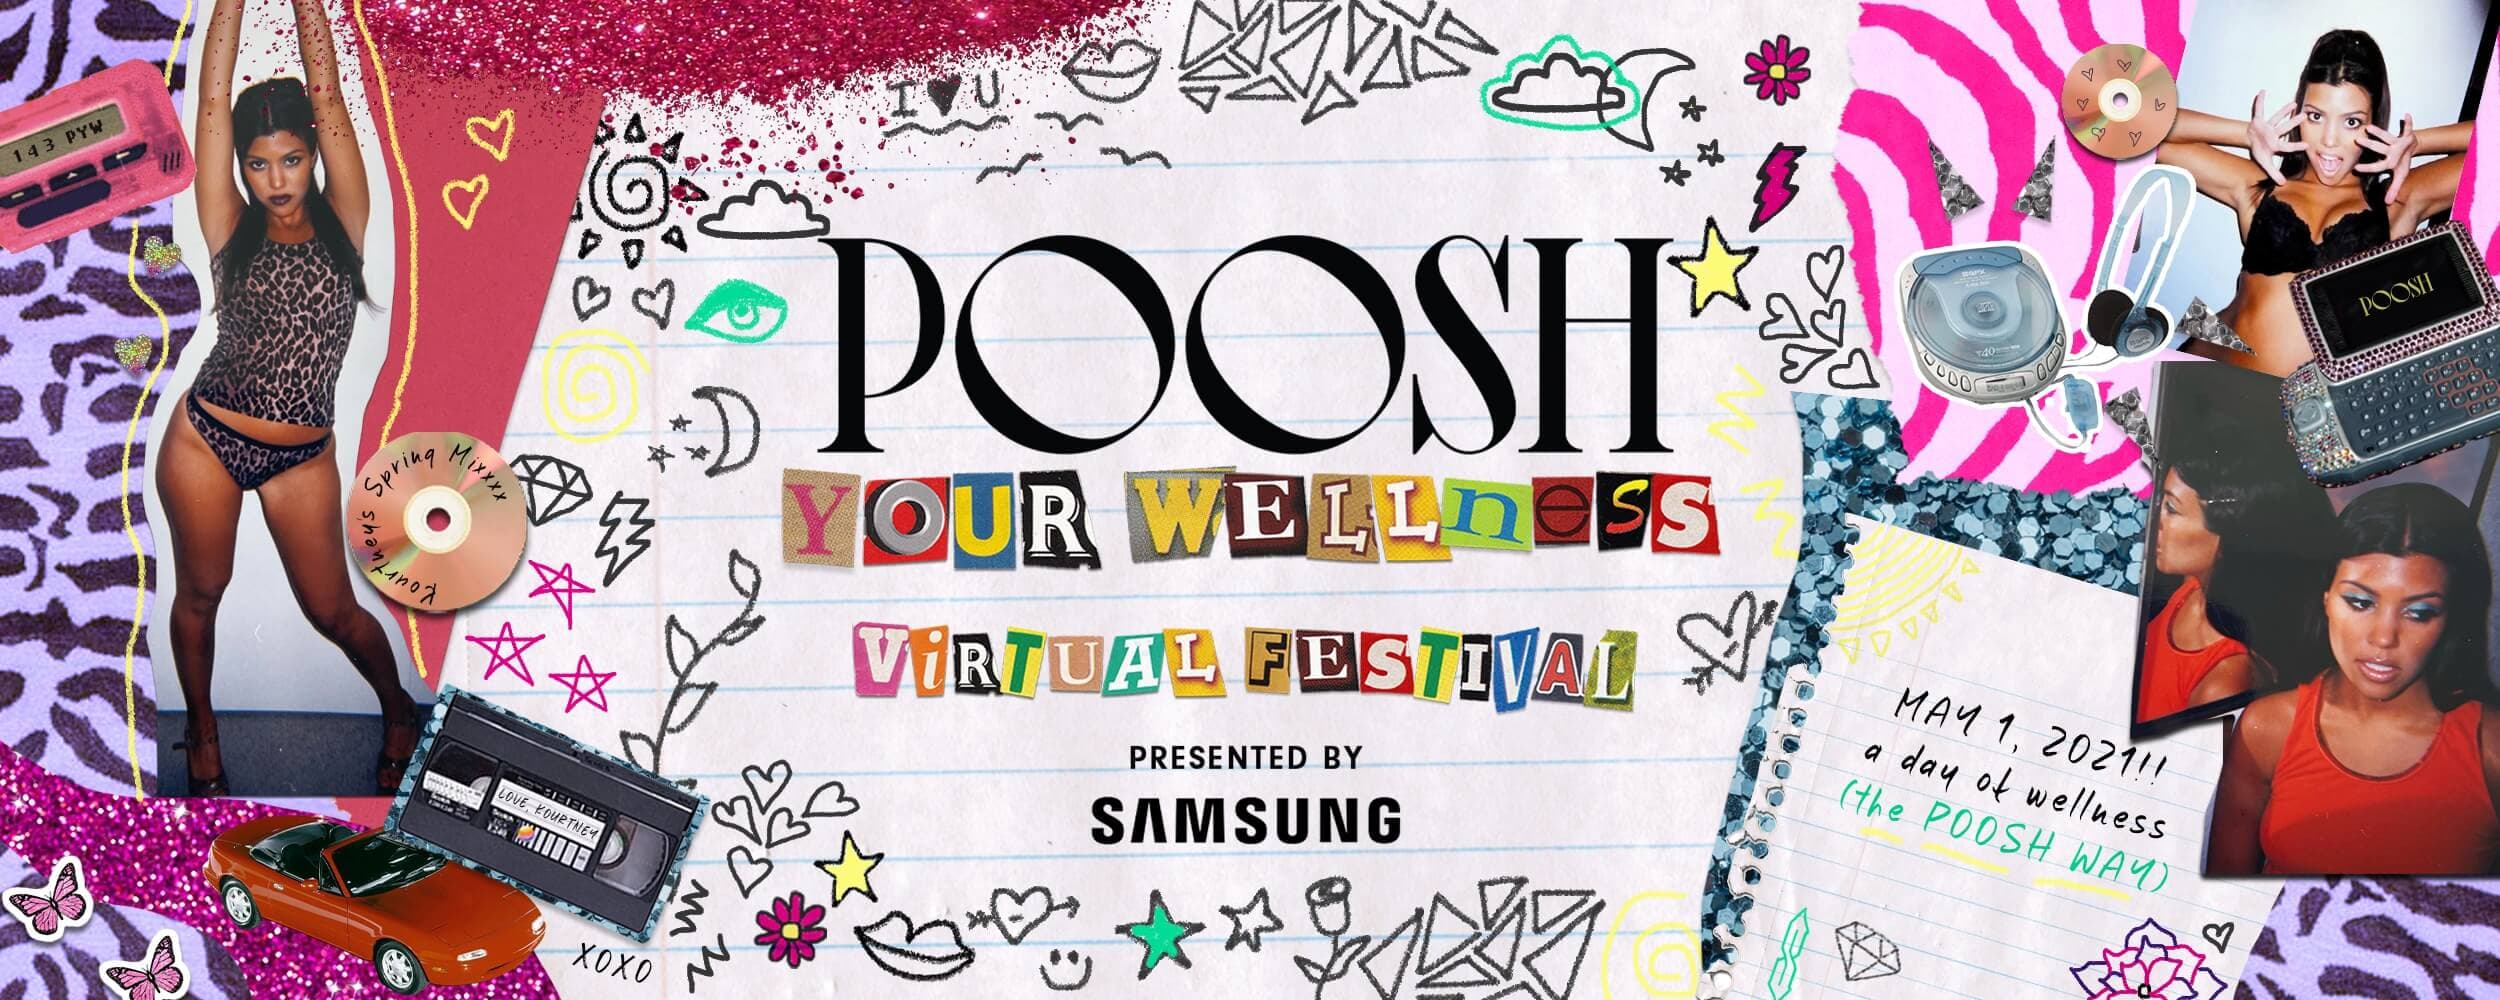 Poosh Your Wellness